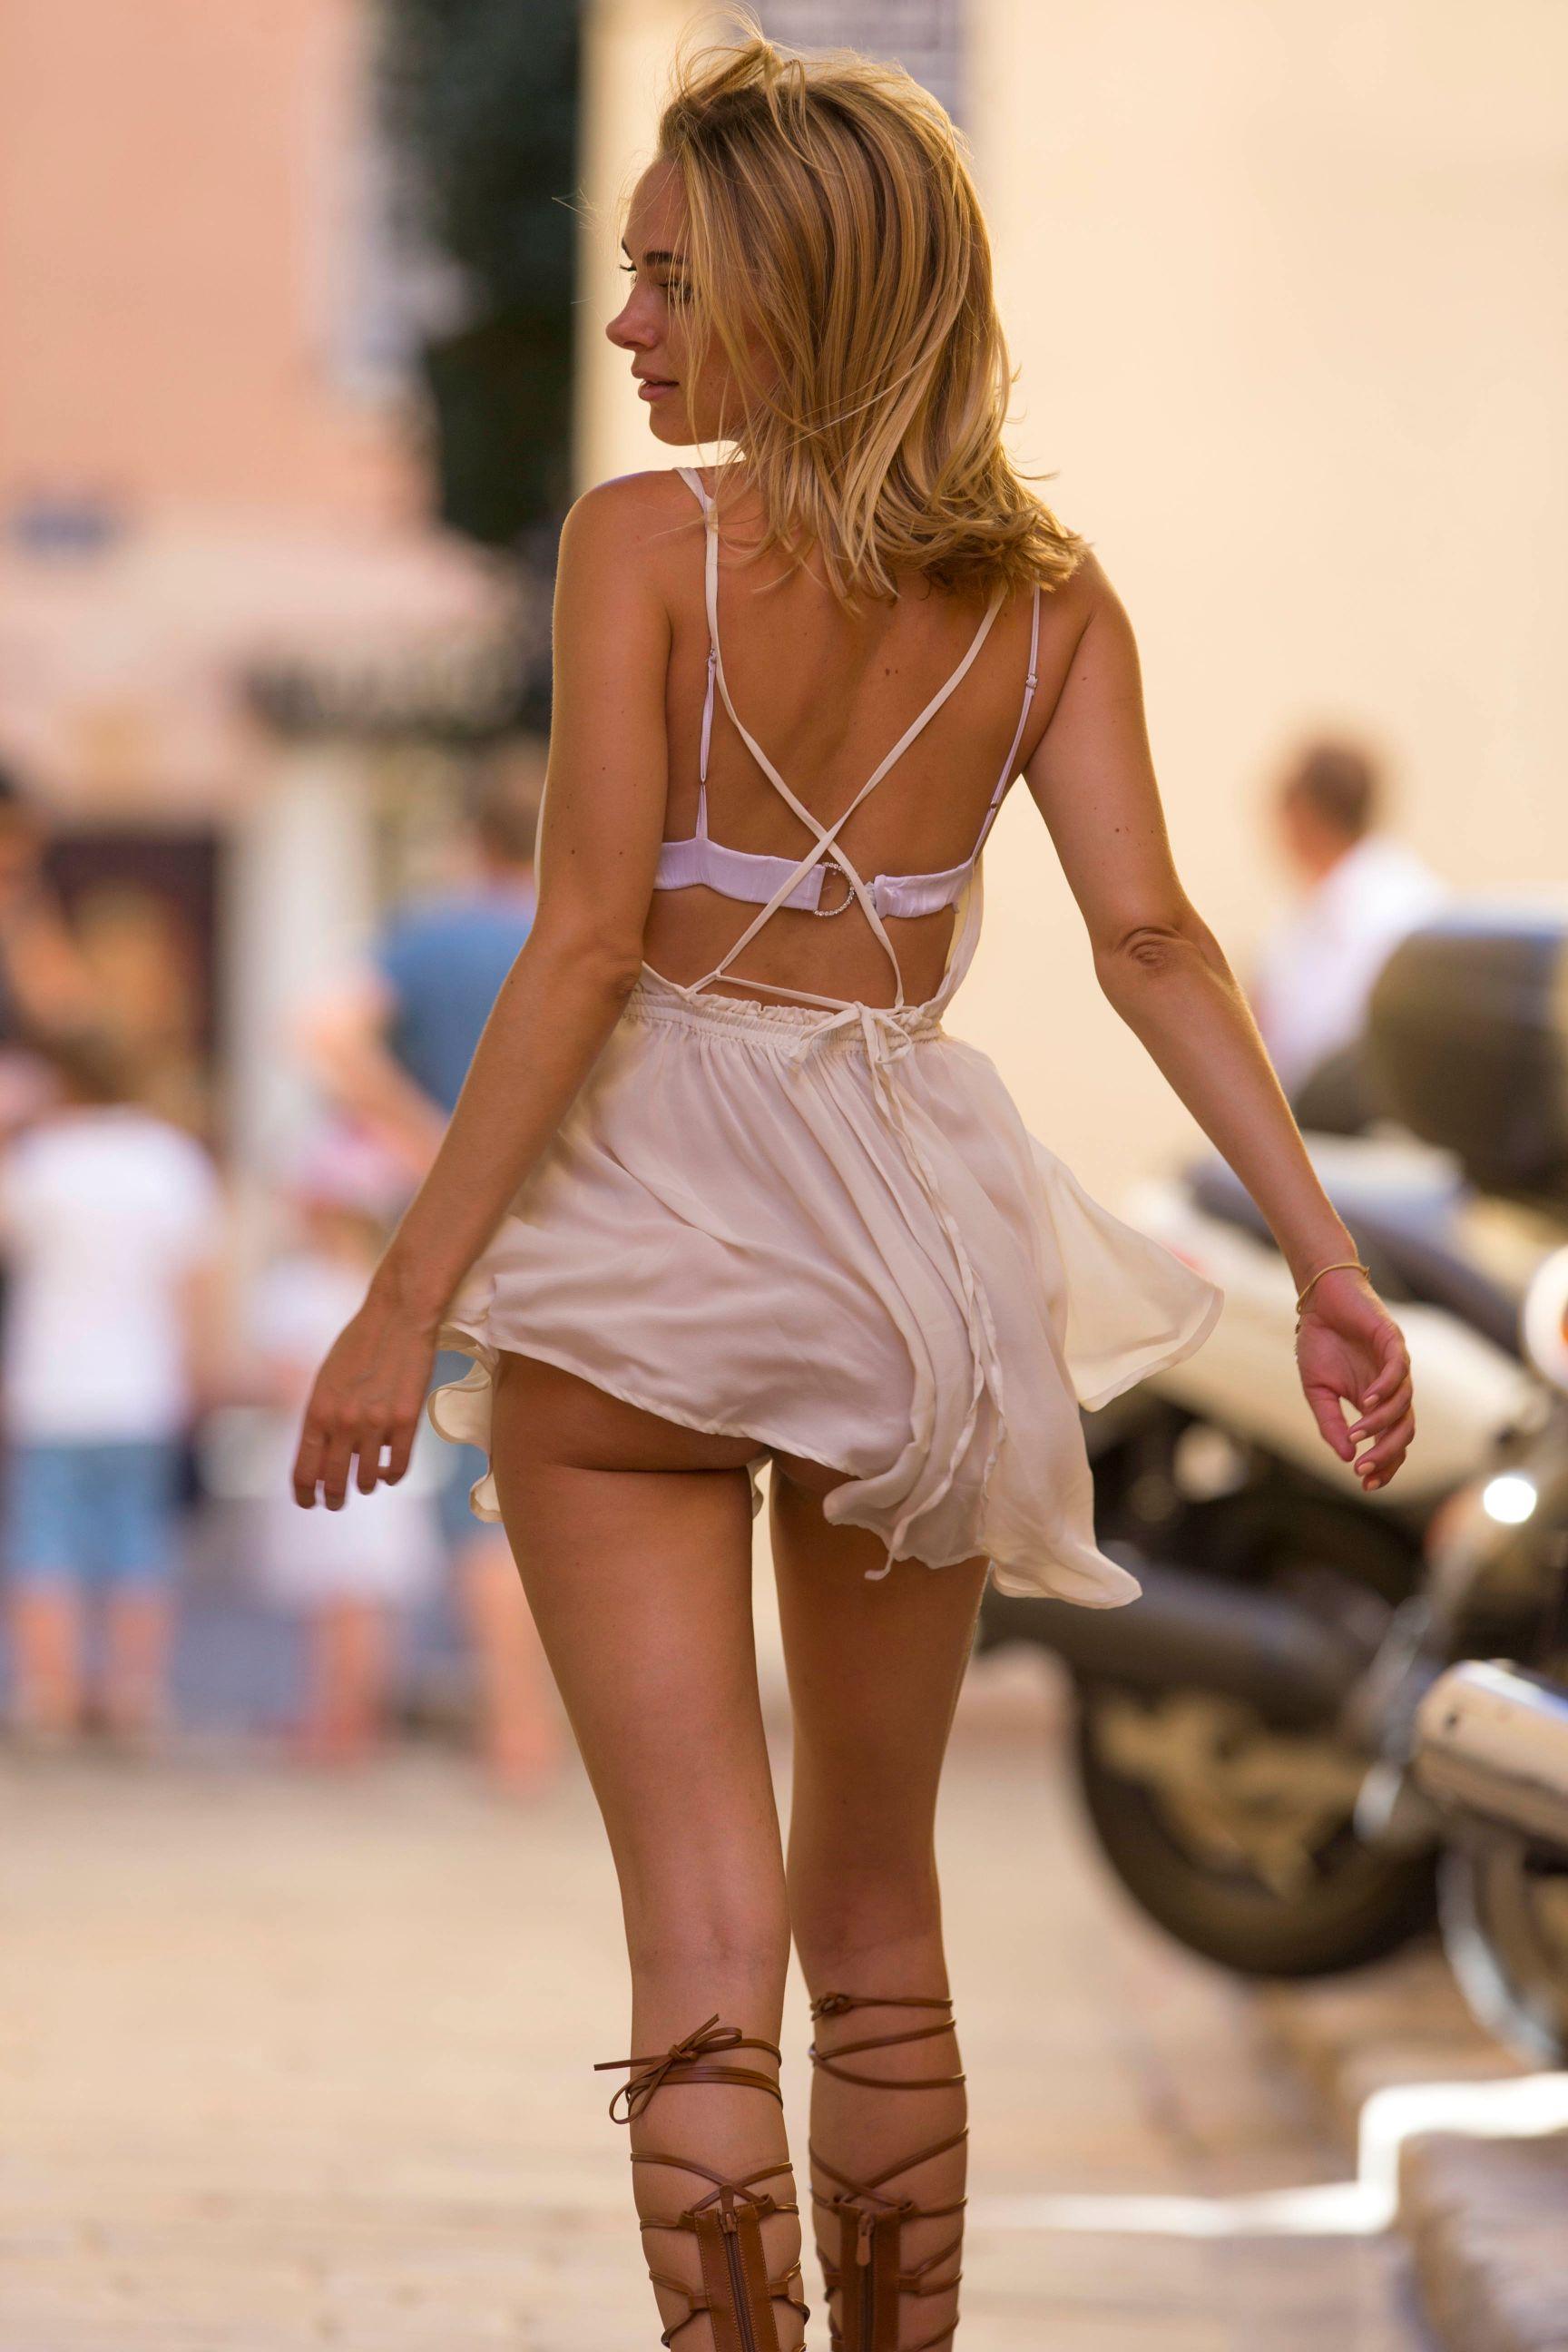 kimberley-garner-upskirt-while-out-shopping-6 | celebrity